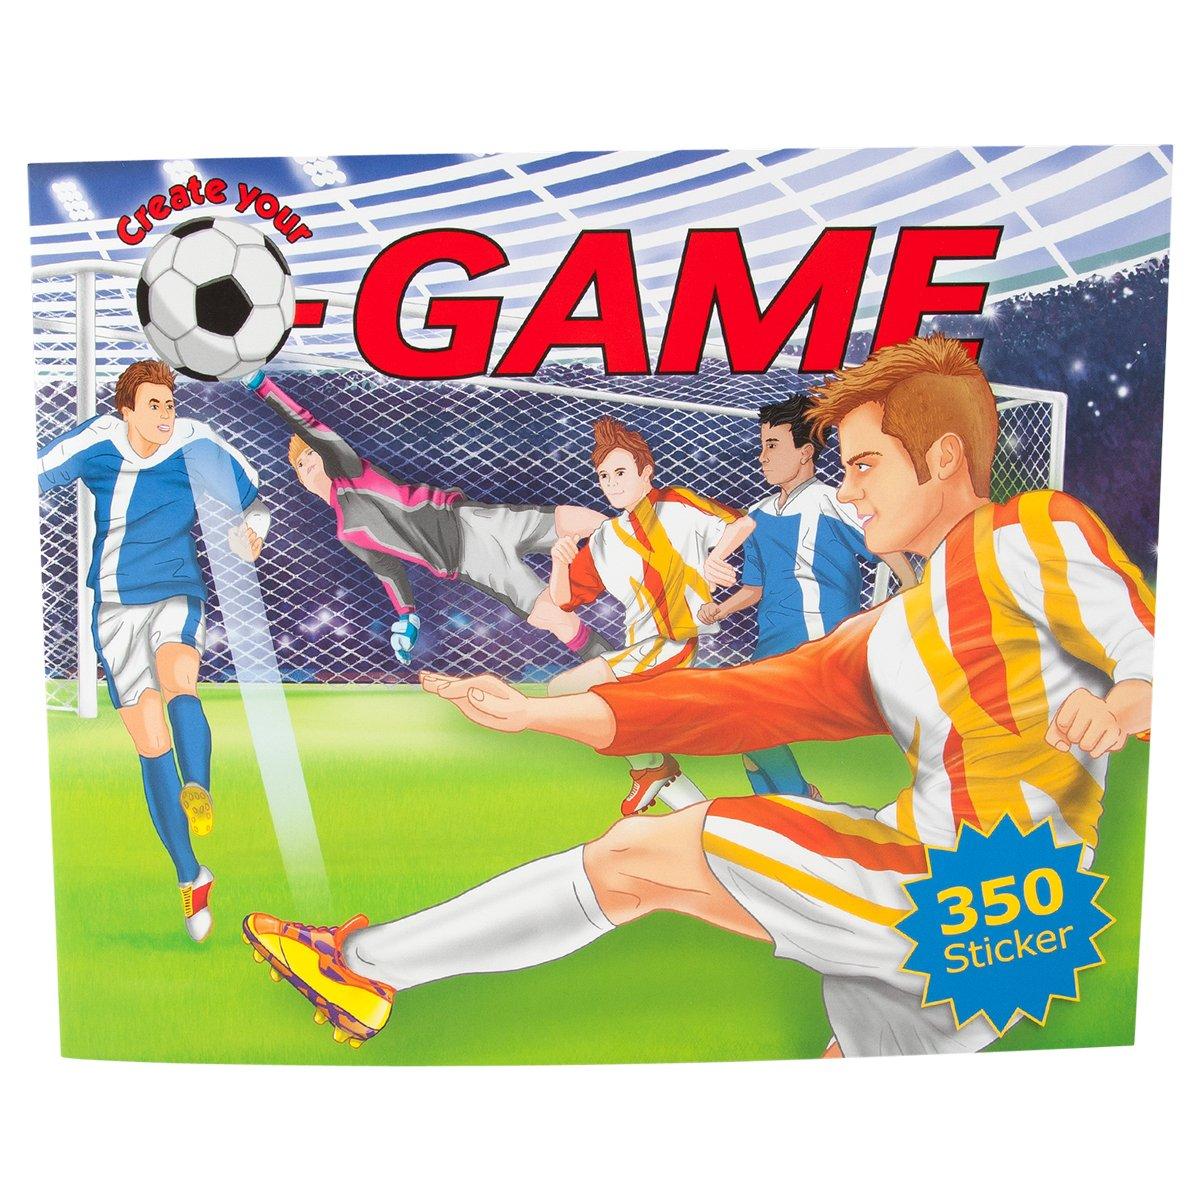 Trend 8064 - Create your Football Game Malbuch: Amazon.de: Spielzeug